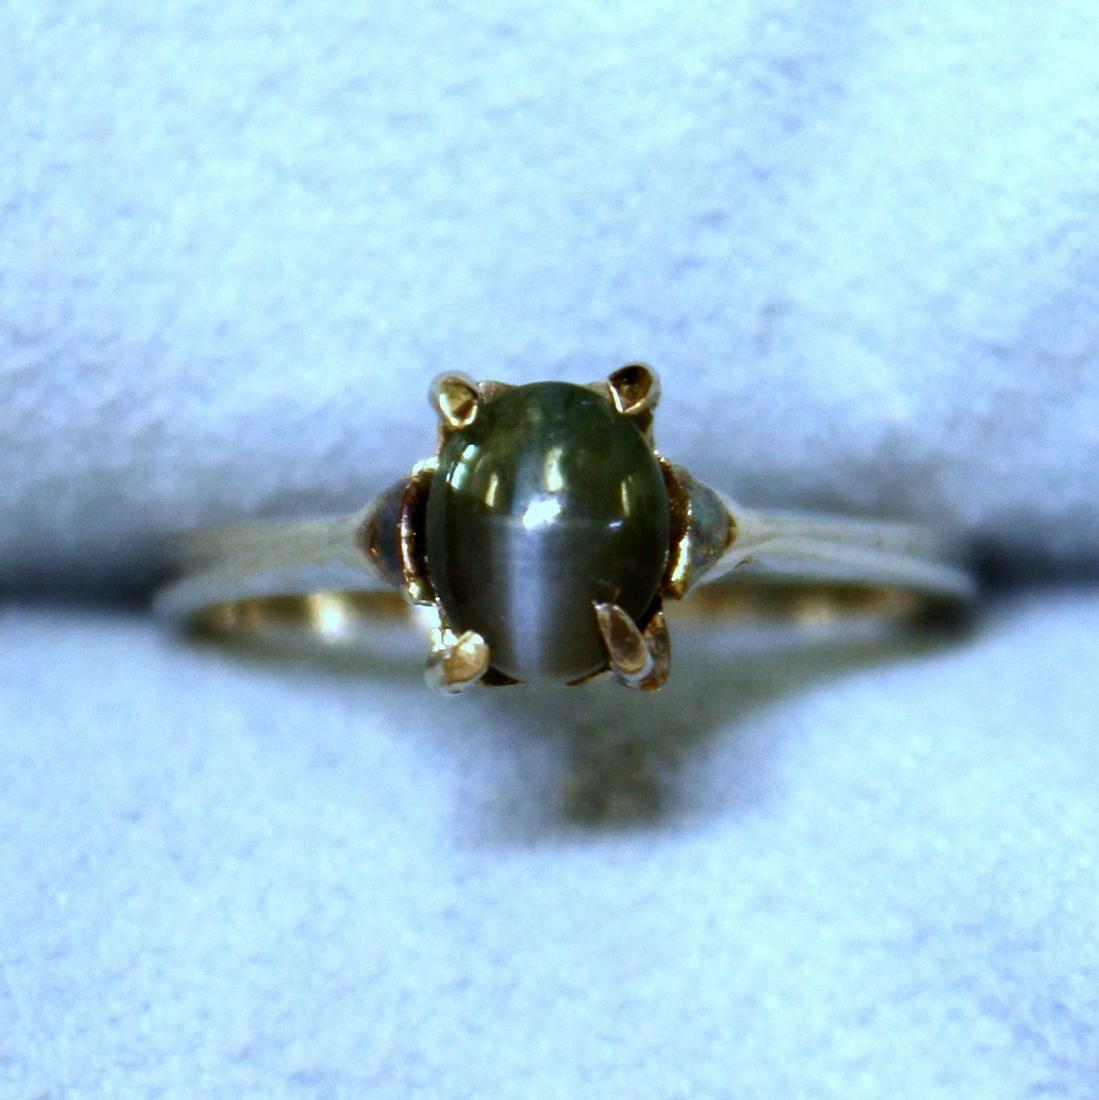 Chrysoberyl Cat's Eye Solitaire Ring in 14K White Gold